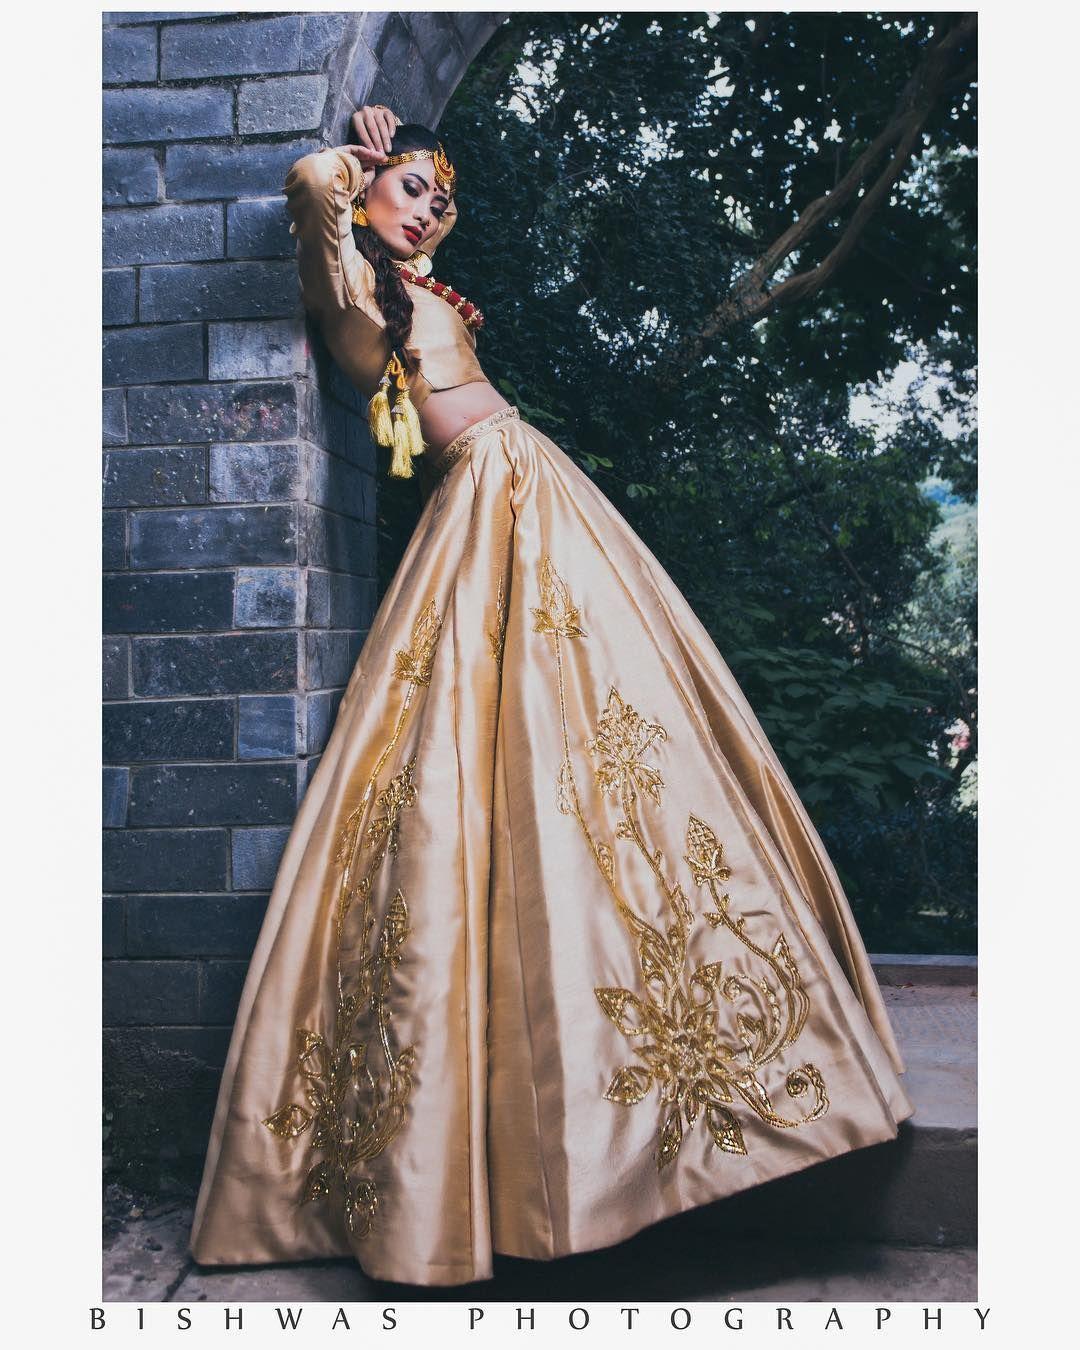 Be A Nepali Bride This Wedding Season Nepaliheritage Revivingchaubandiandfariya Handcraftedwithlove Manishraibrida Bride Wedding Season Indian Outfits